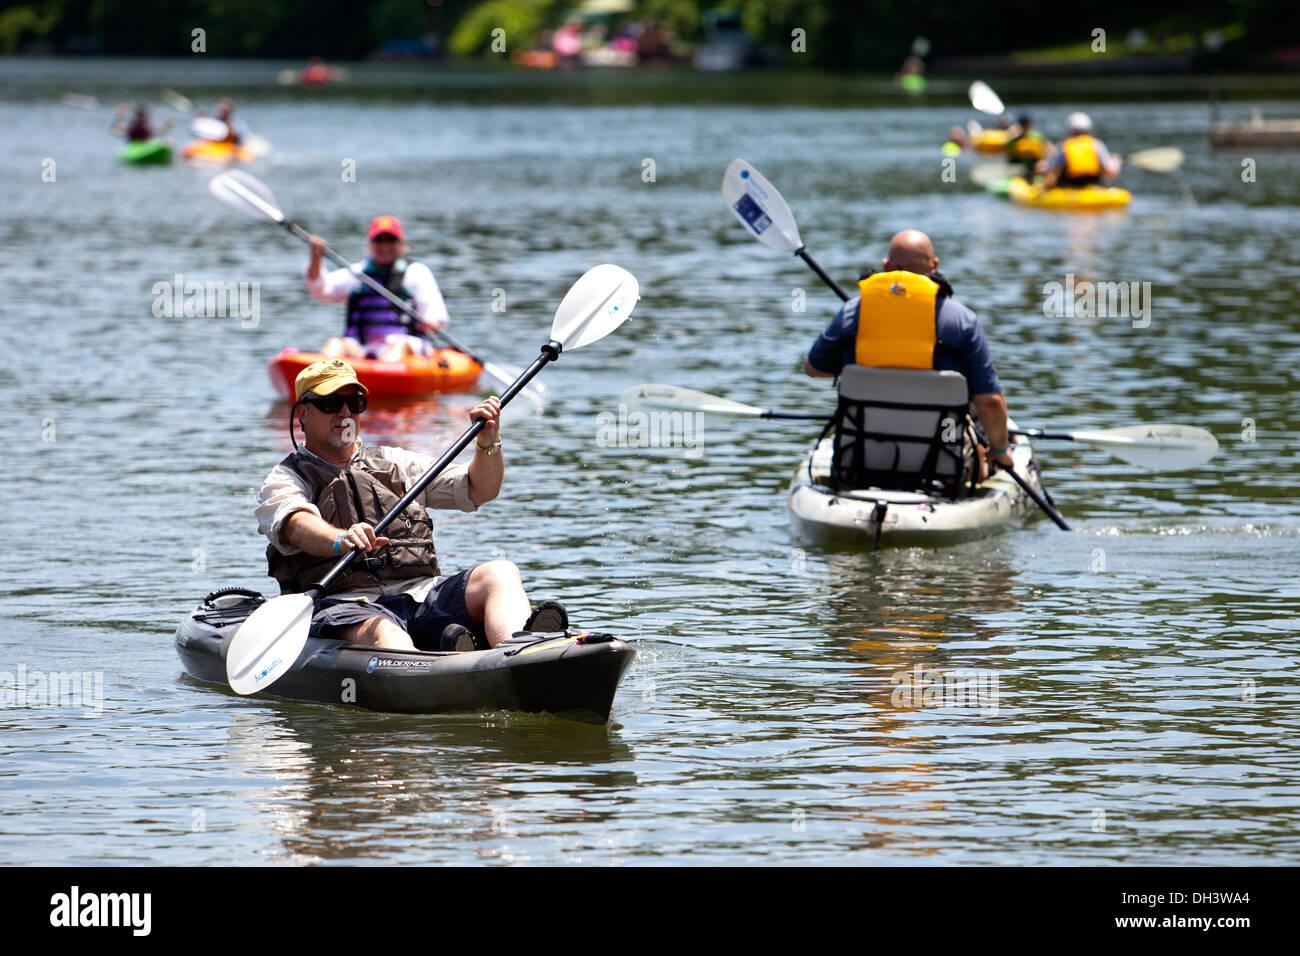 Kayakers paddling on a lake in Bella Vista, Arkansas, USA. Stock Photo